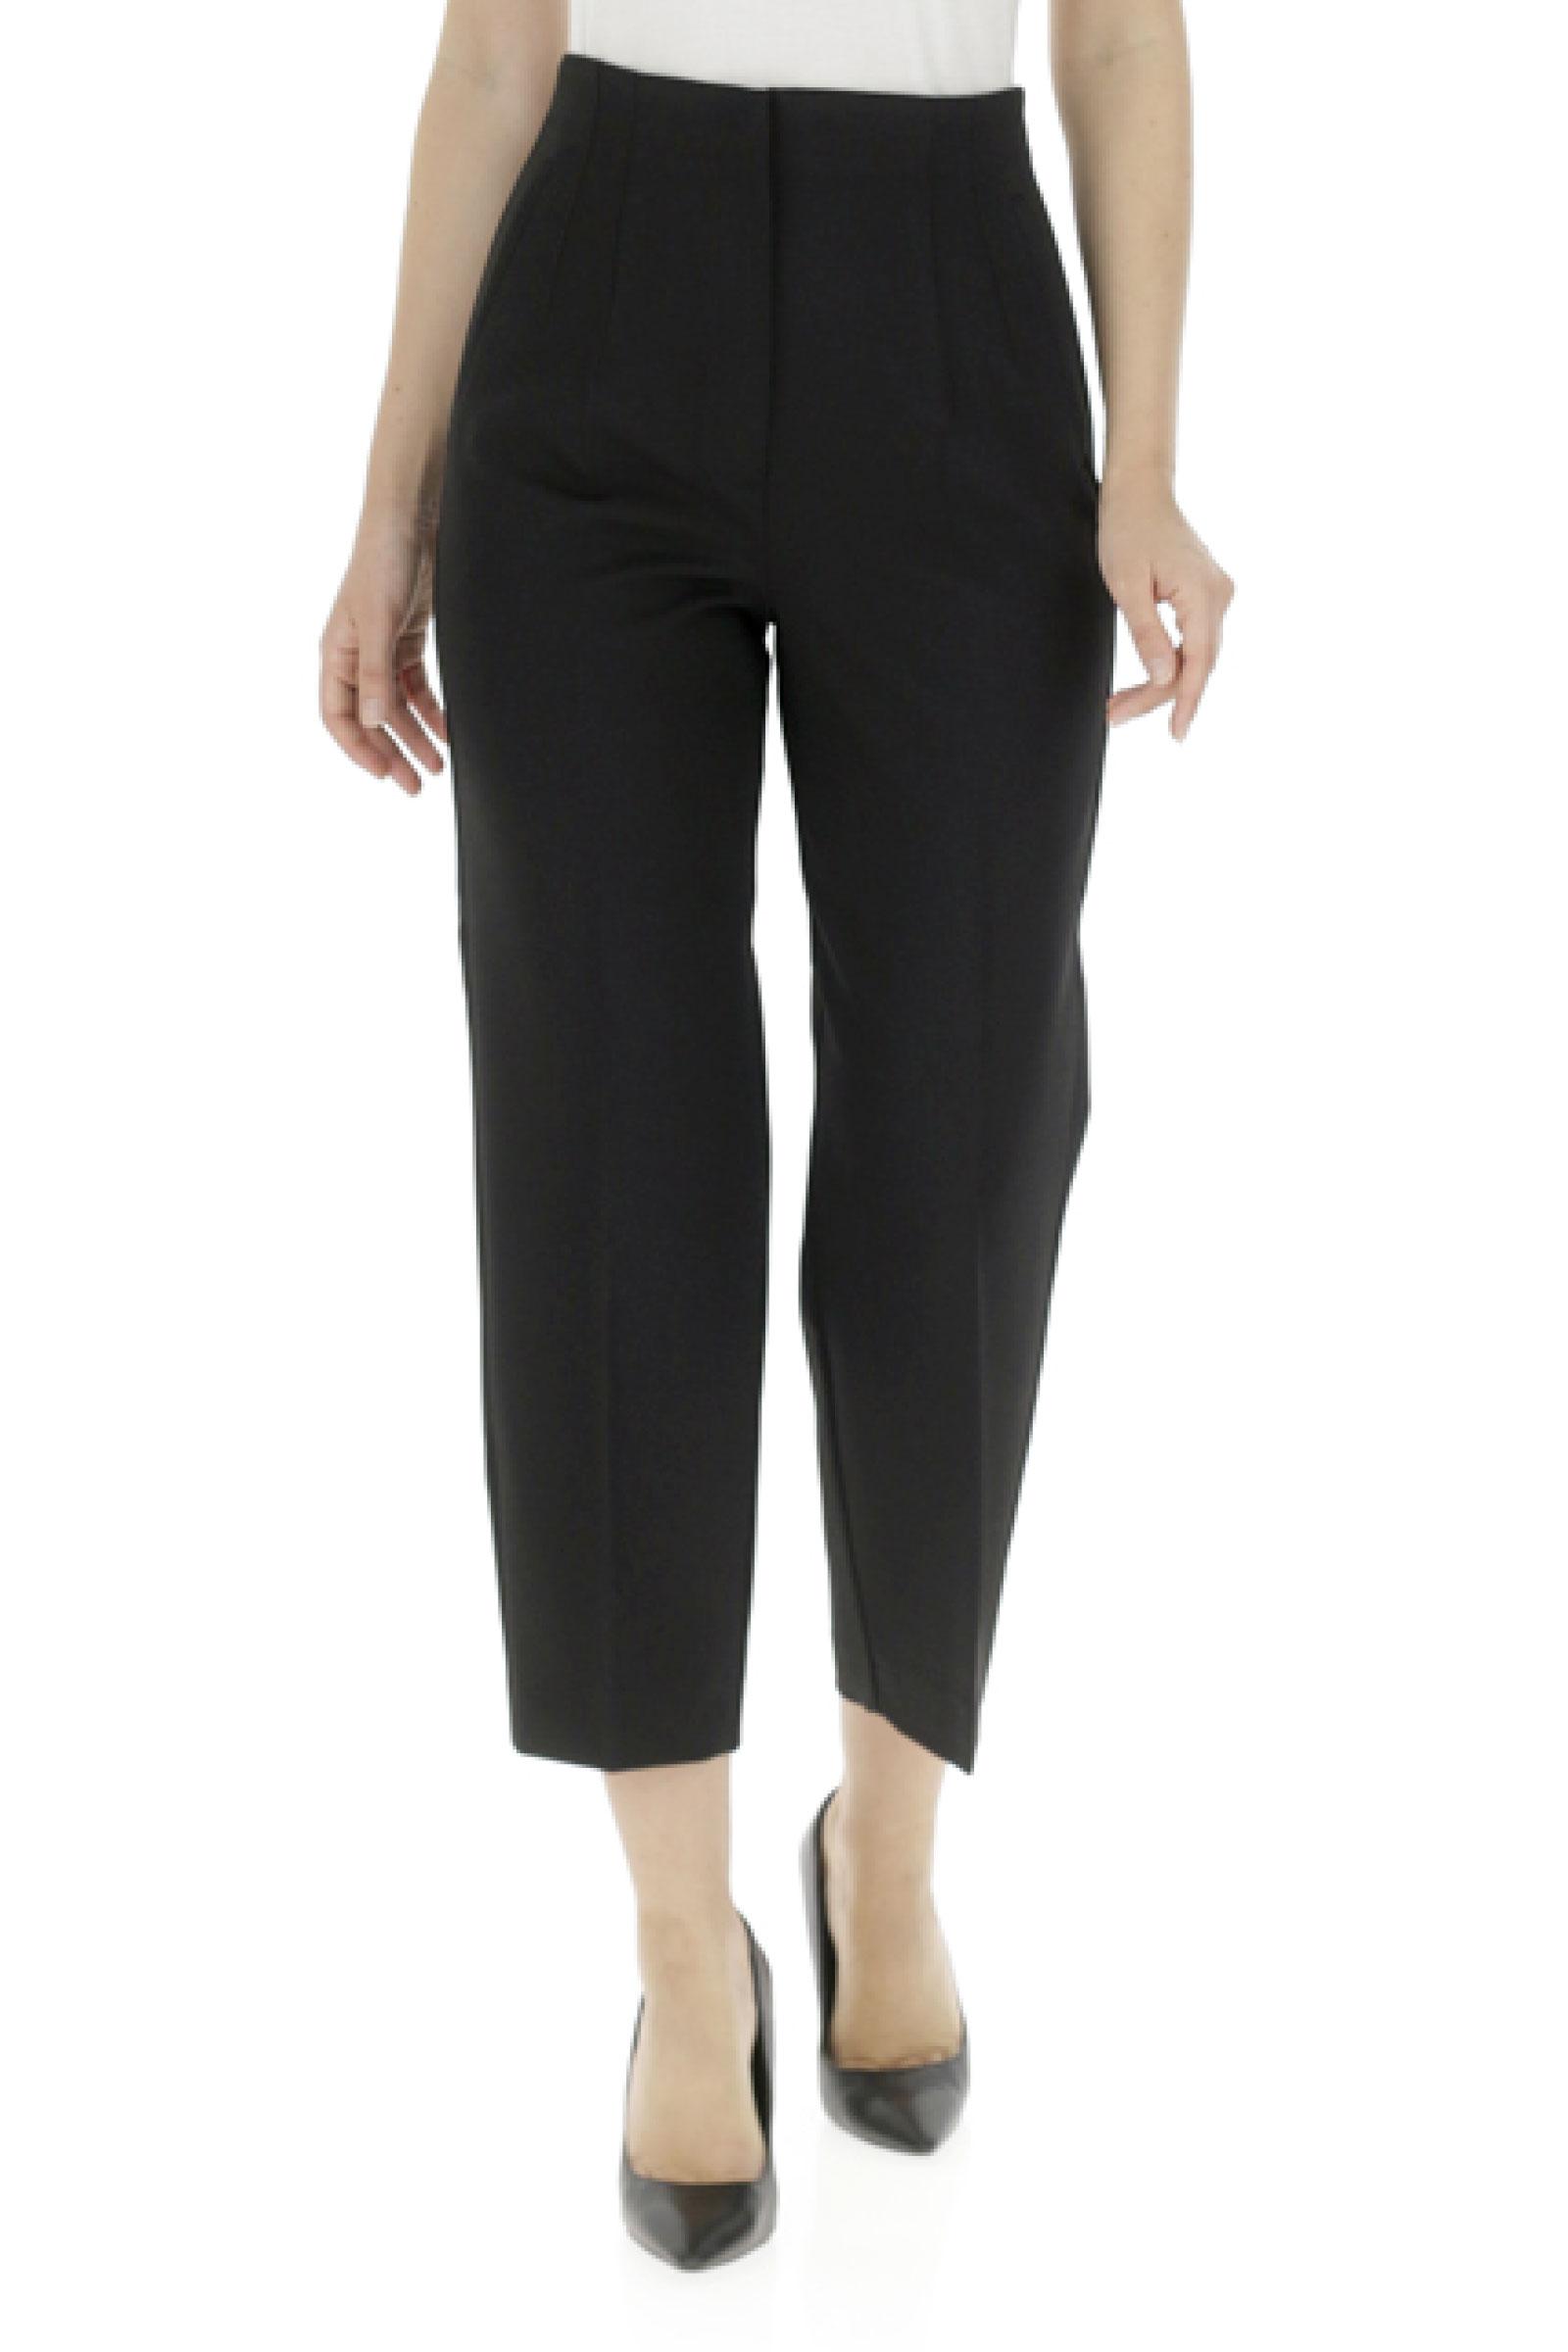 Pantalone Donna Modello TOMMY EMME MARELLA   Pantalone   51360719200003